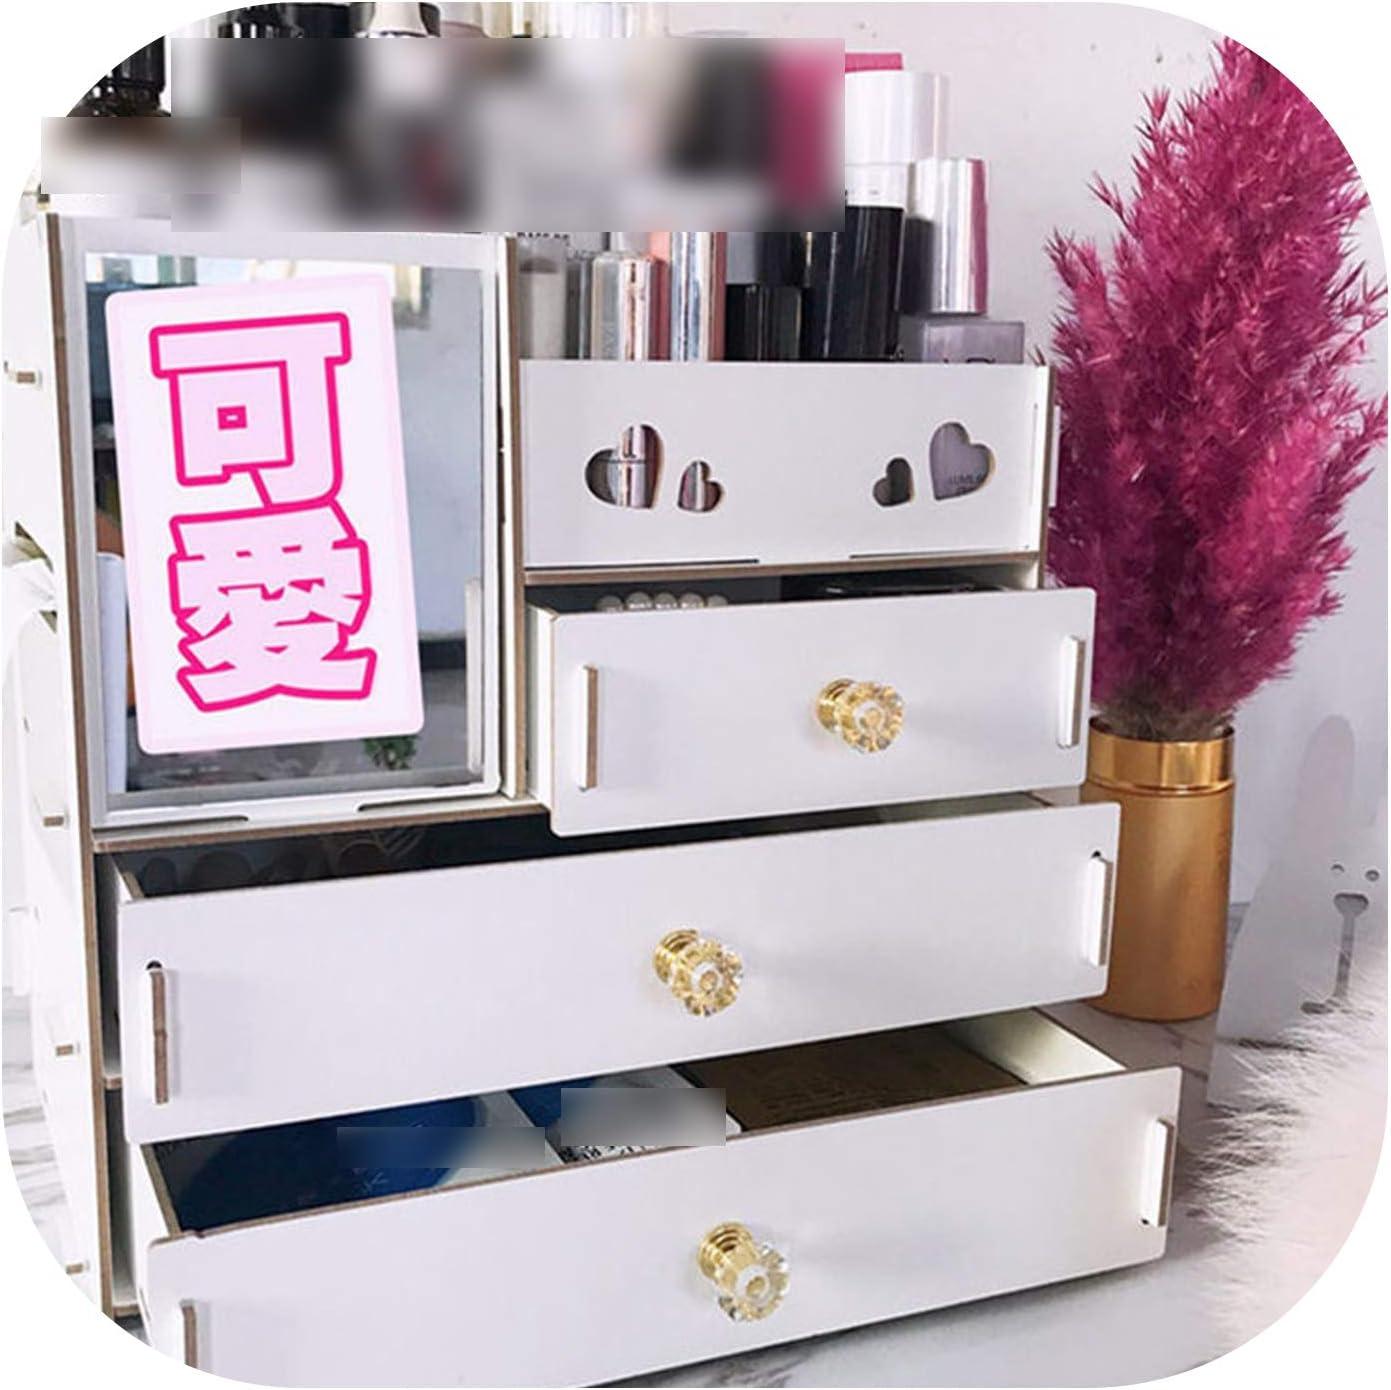 Amazon Com Jewelry Container Wood Drawer Organizer Handmade Cosmetic Storage Organizer Box Diy Wooden Storage Box Makeup Organizer P